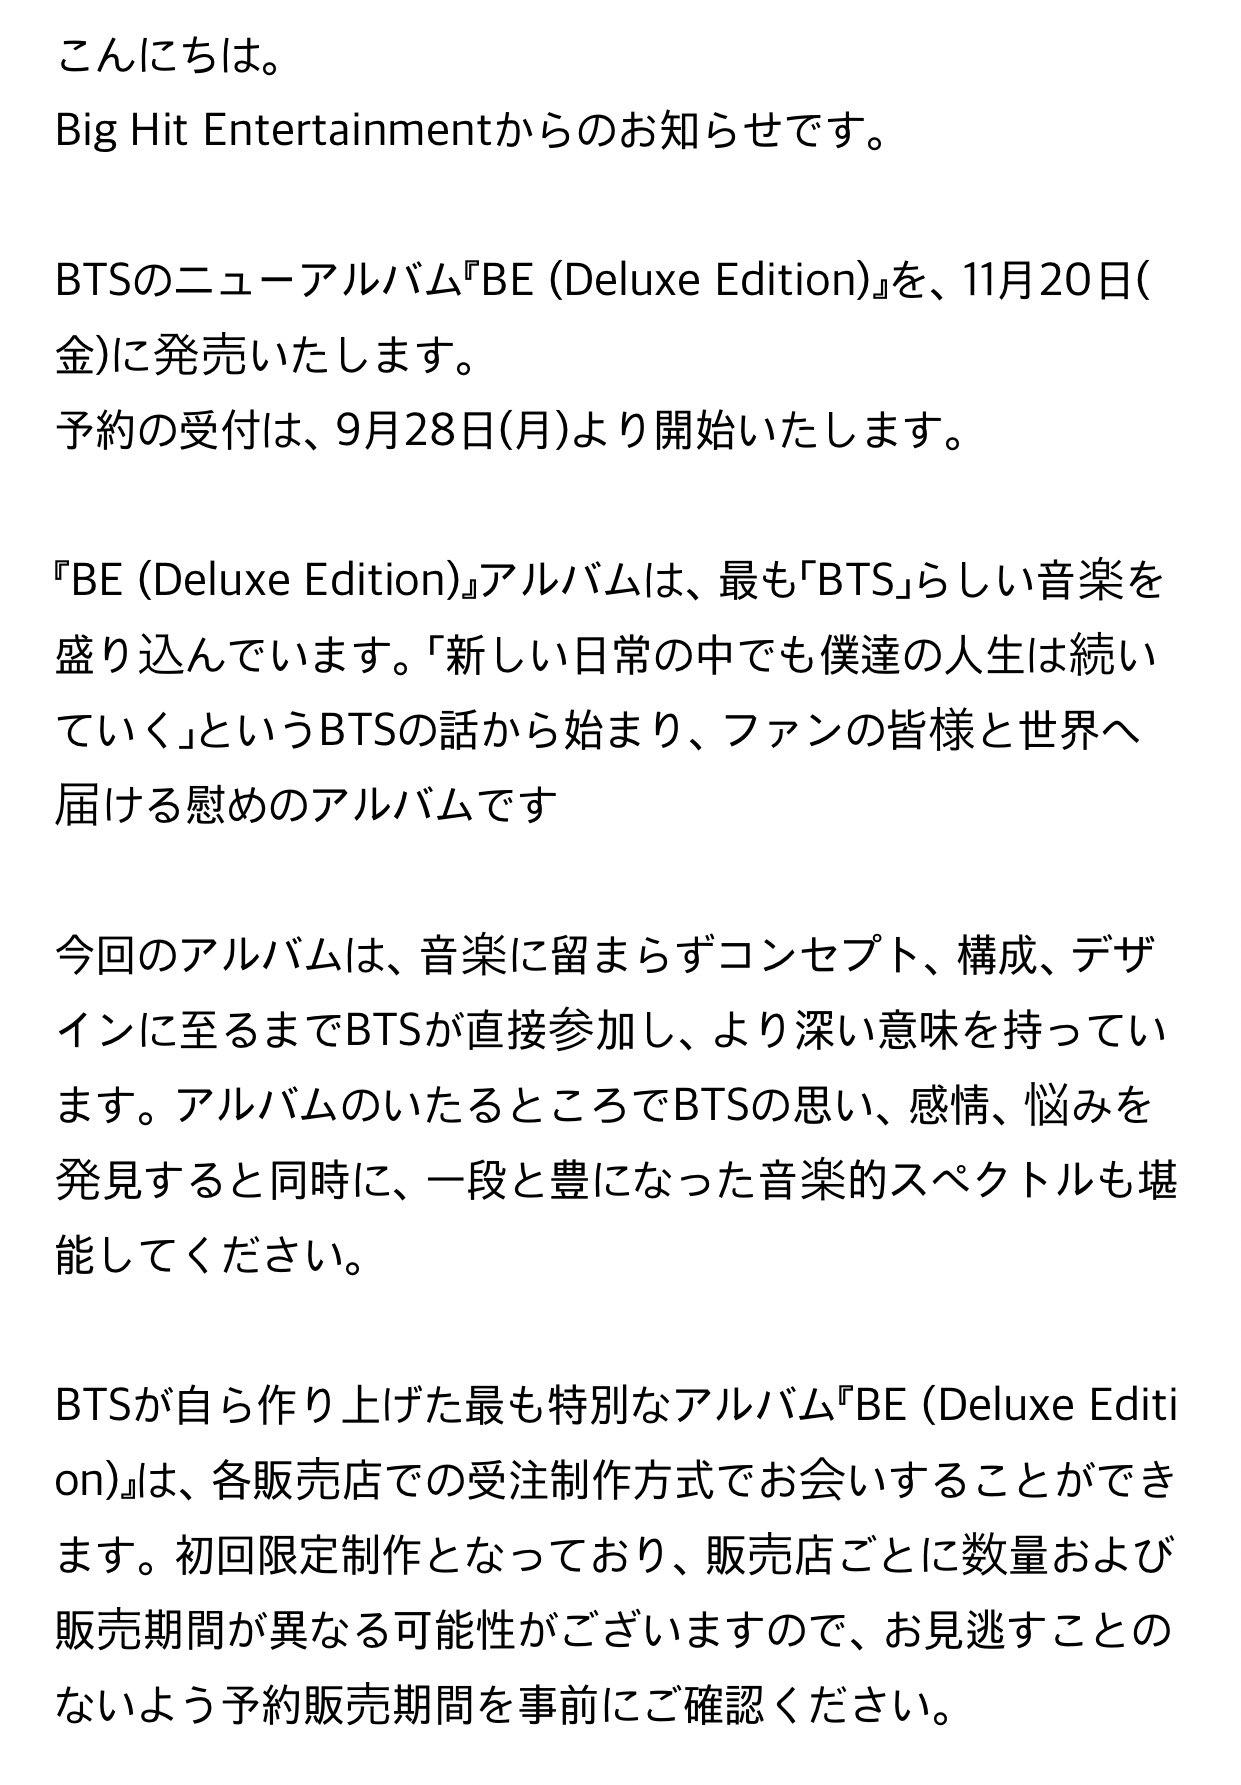 Be 曲 収録 アルバム bts